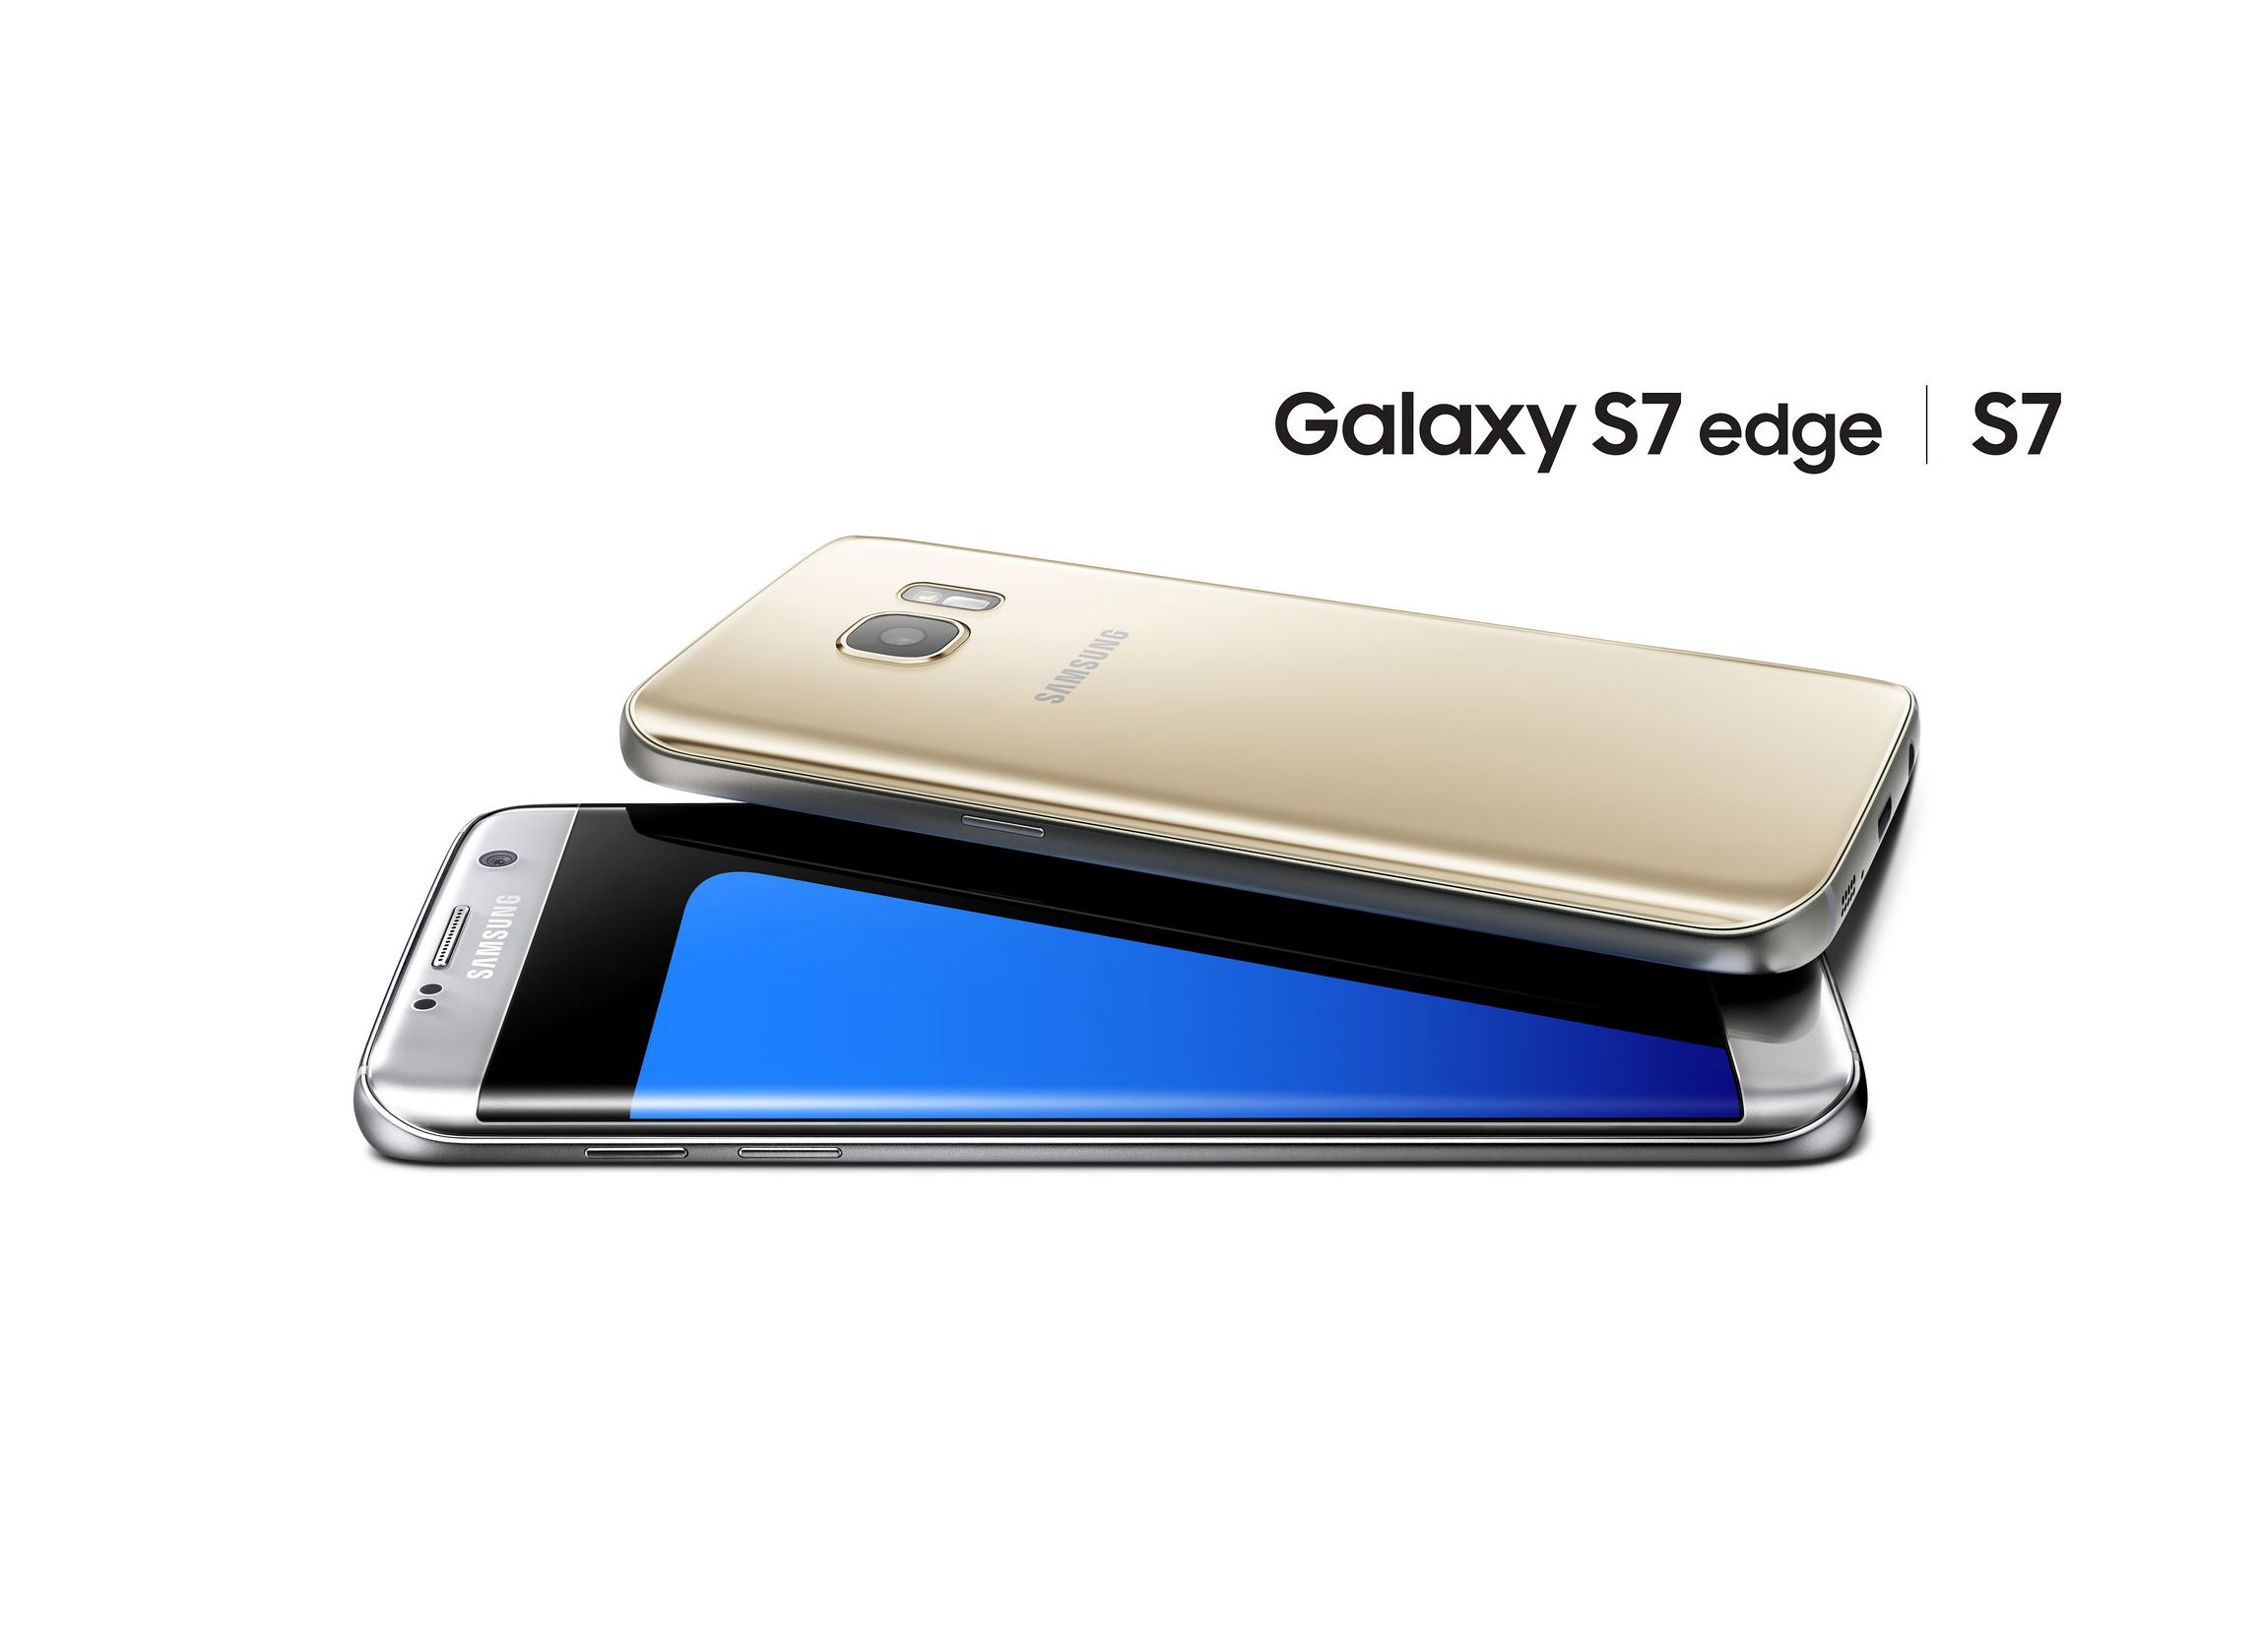 The Galaxy S7 Edge